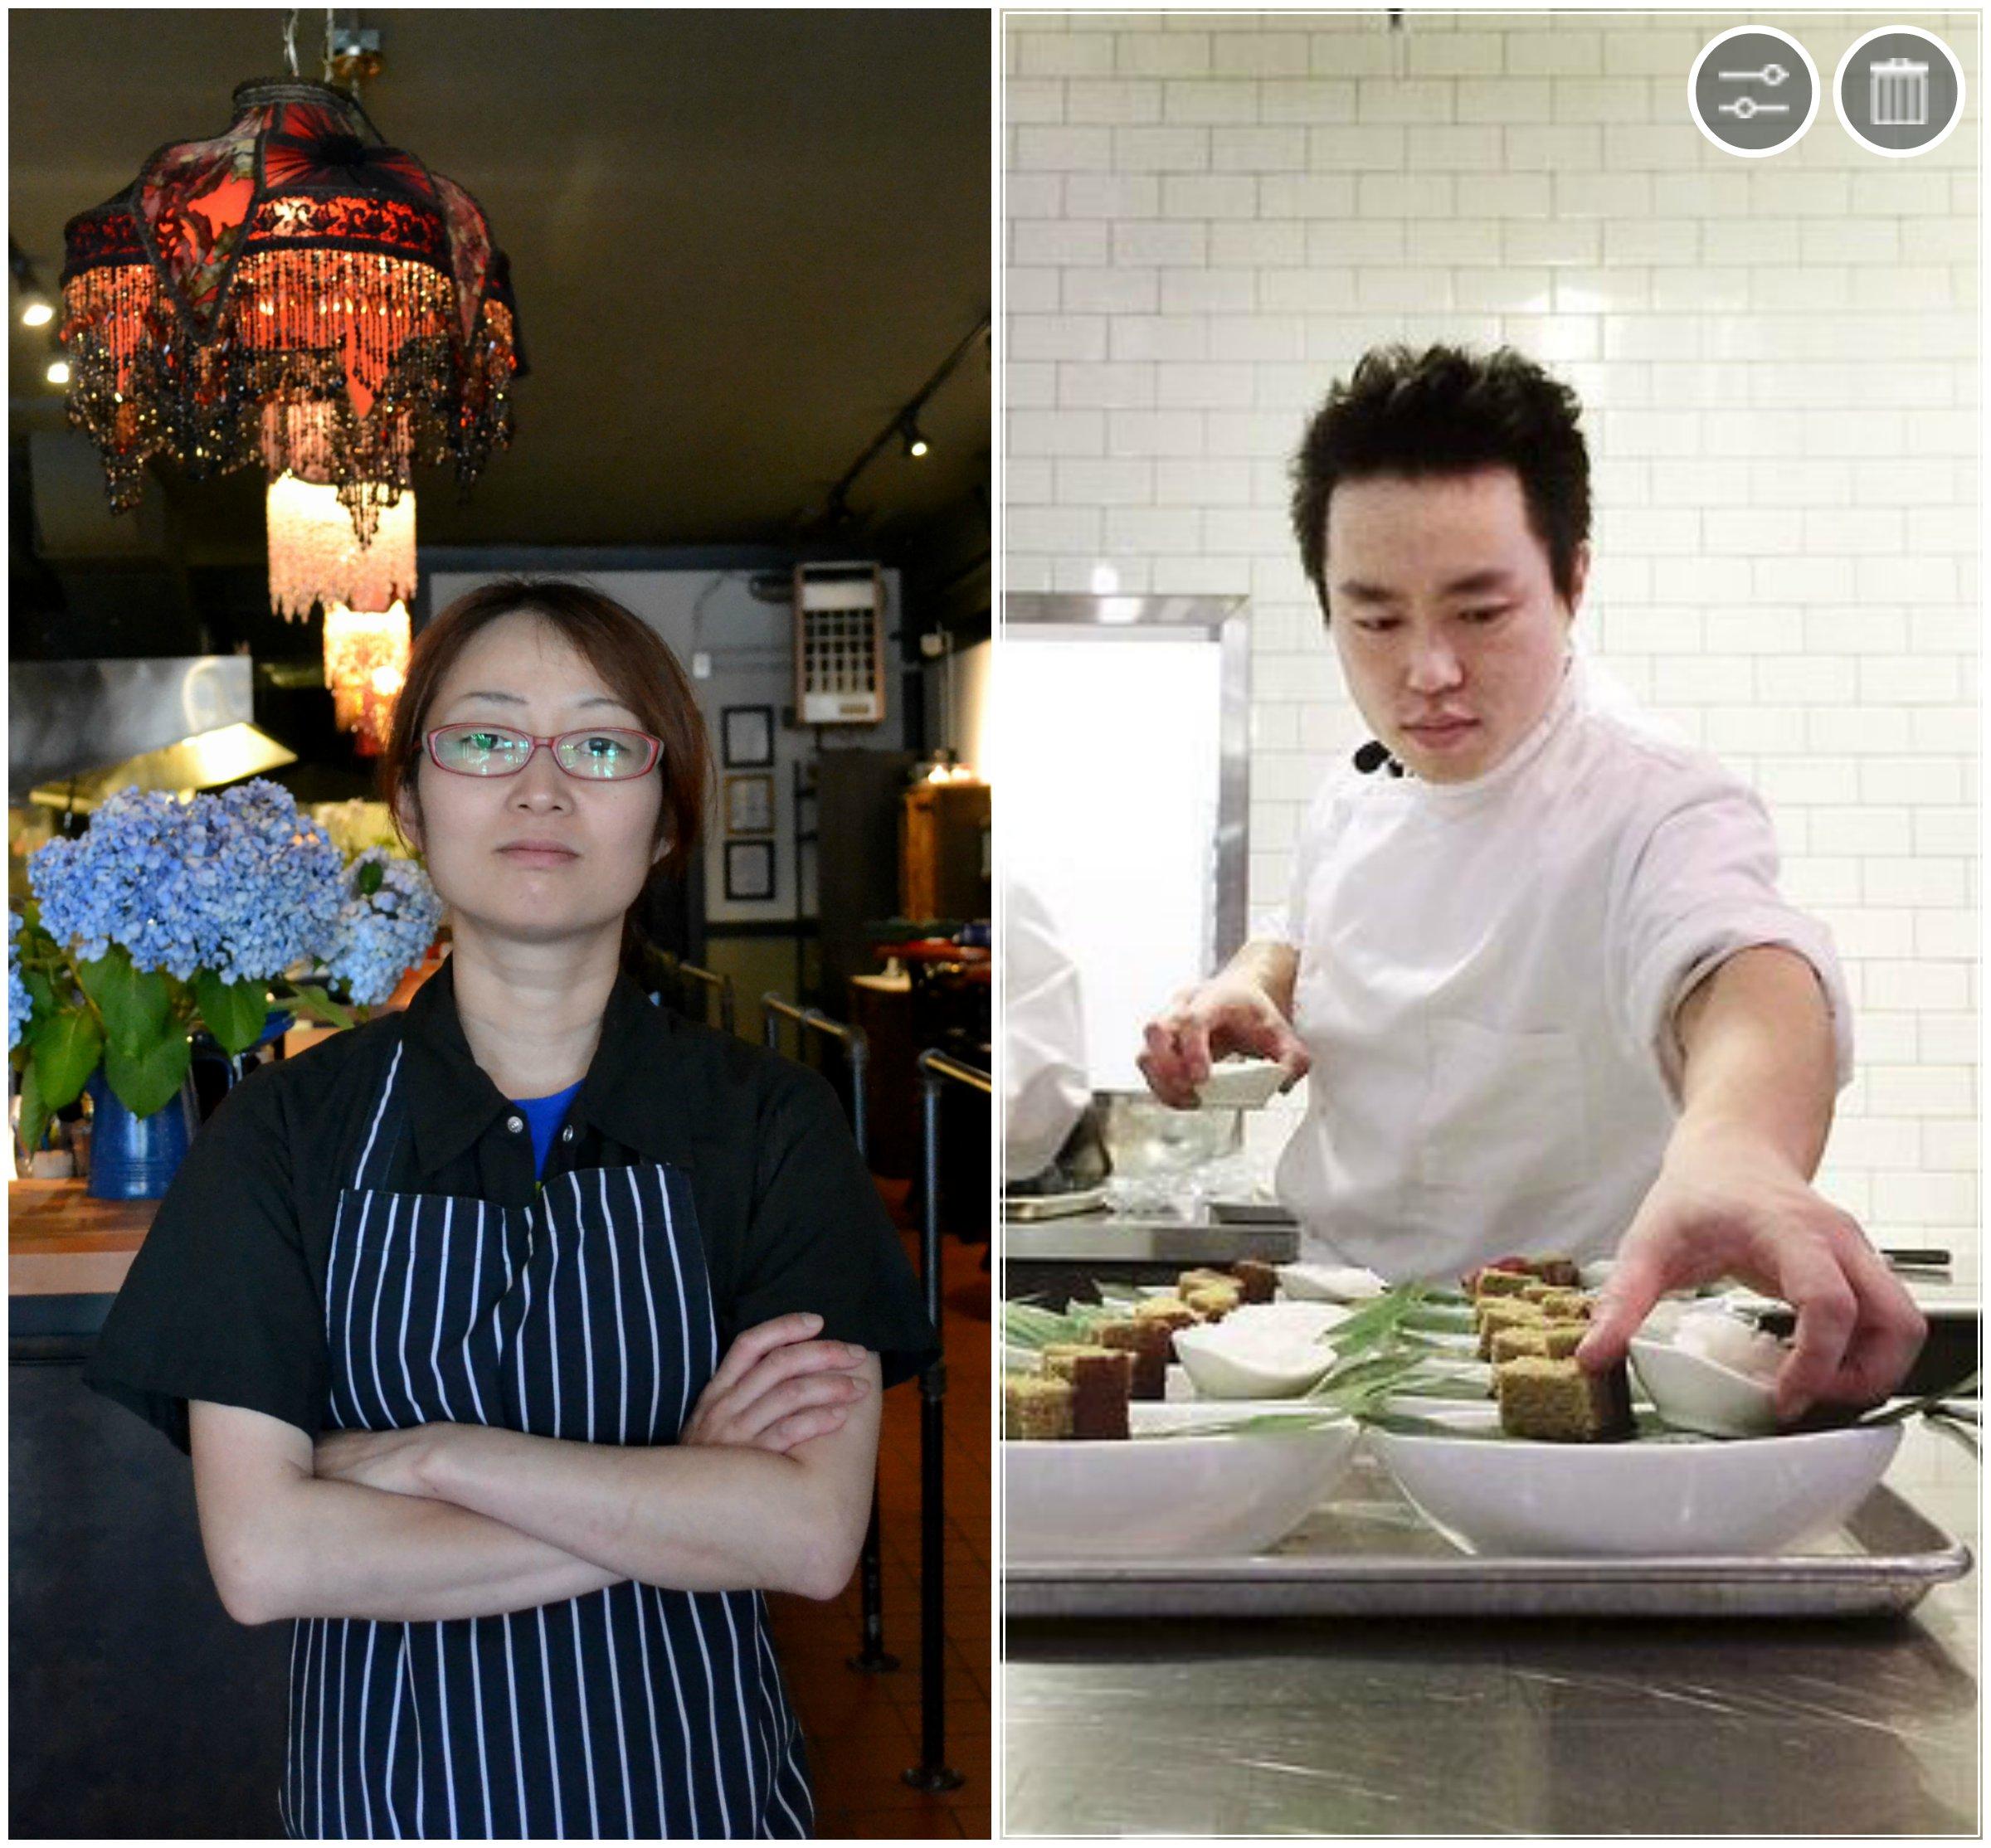 Mutsuko Soma and Hiro Tawara